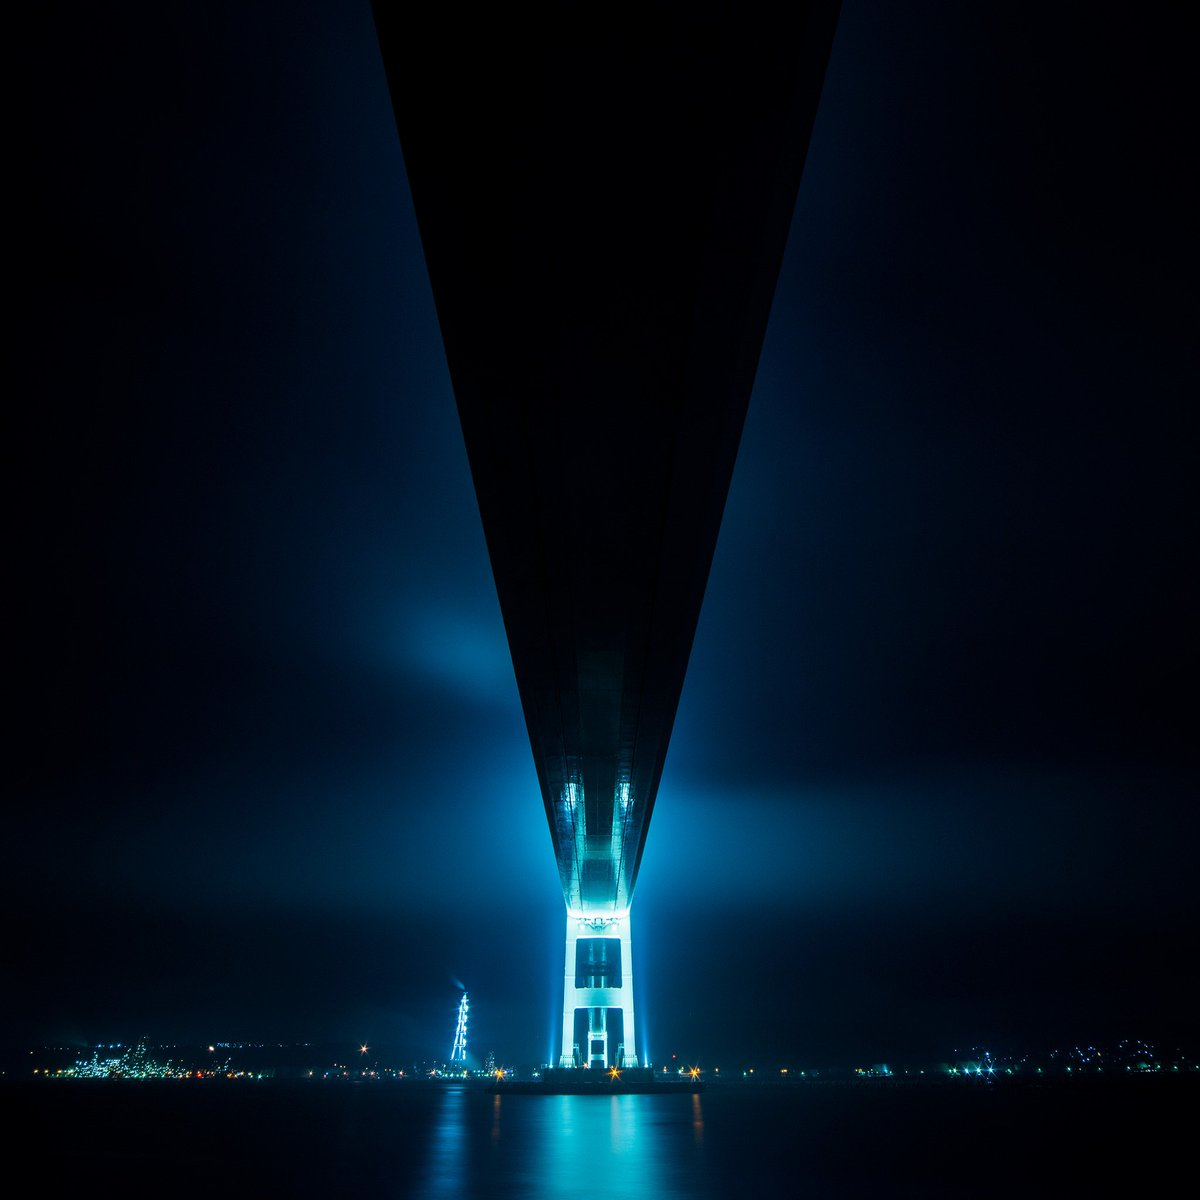 通行止め 白鳥 大橋